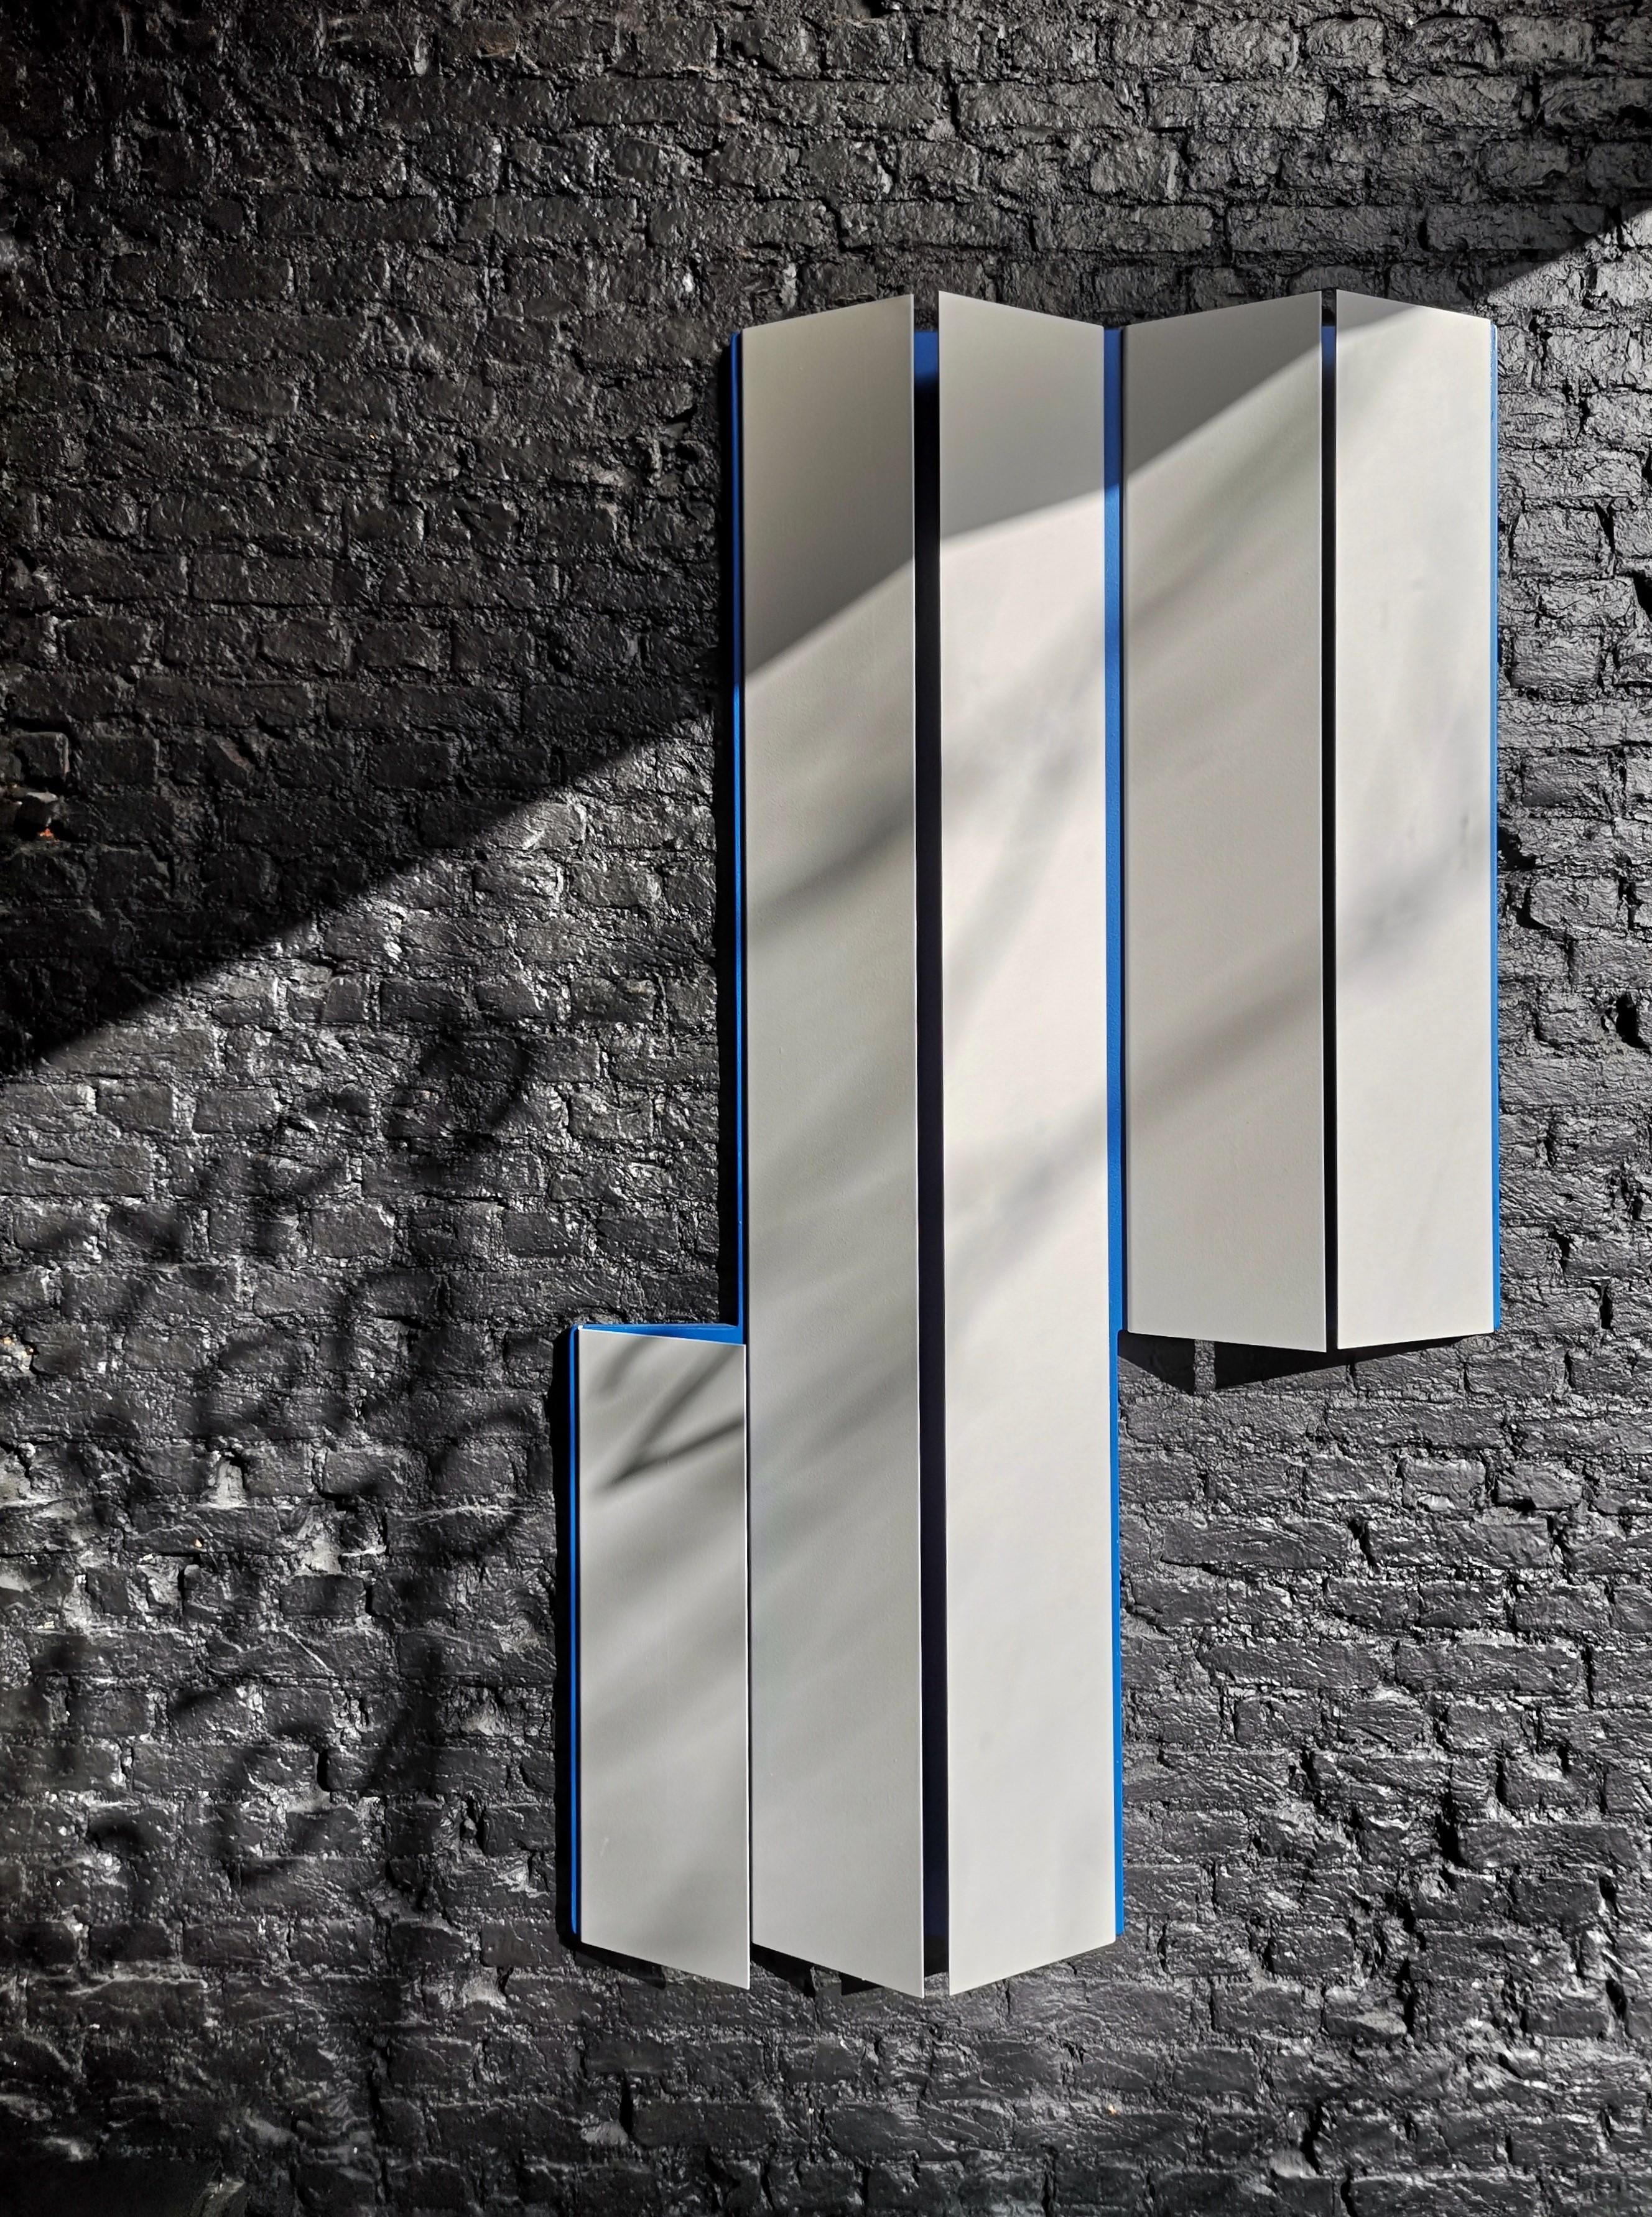 Verrard_blue